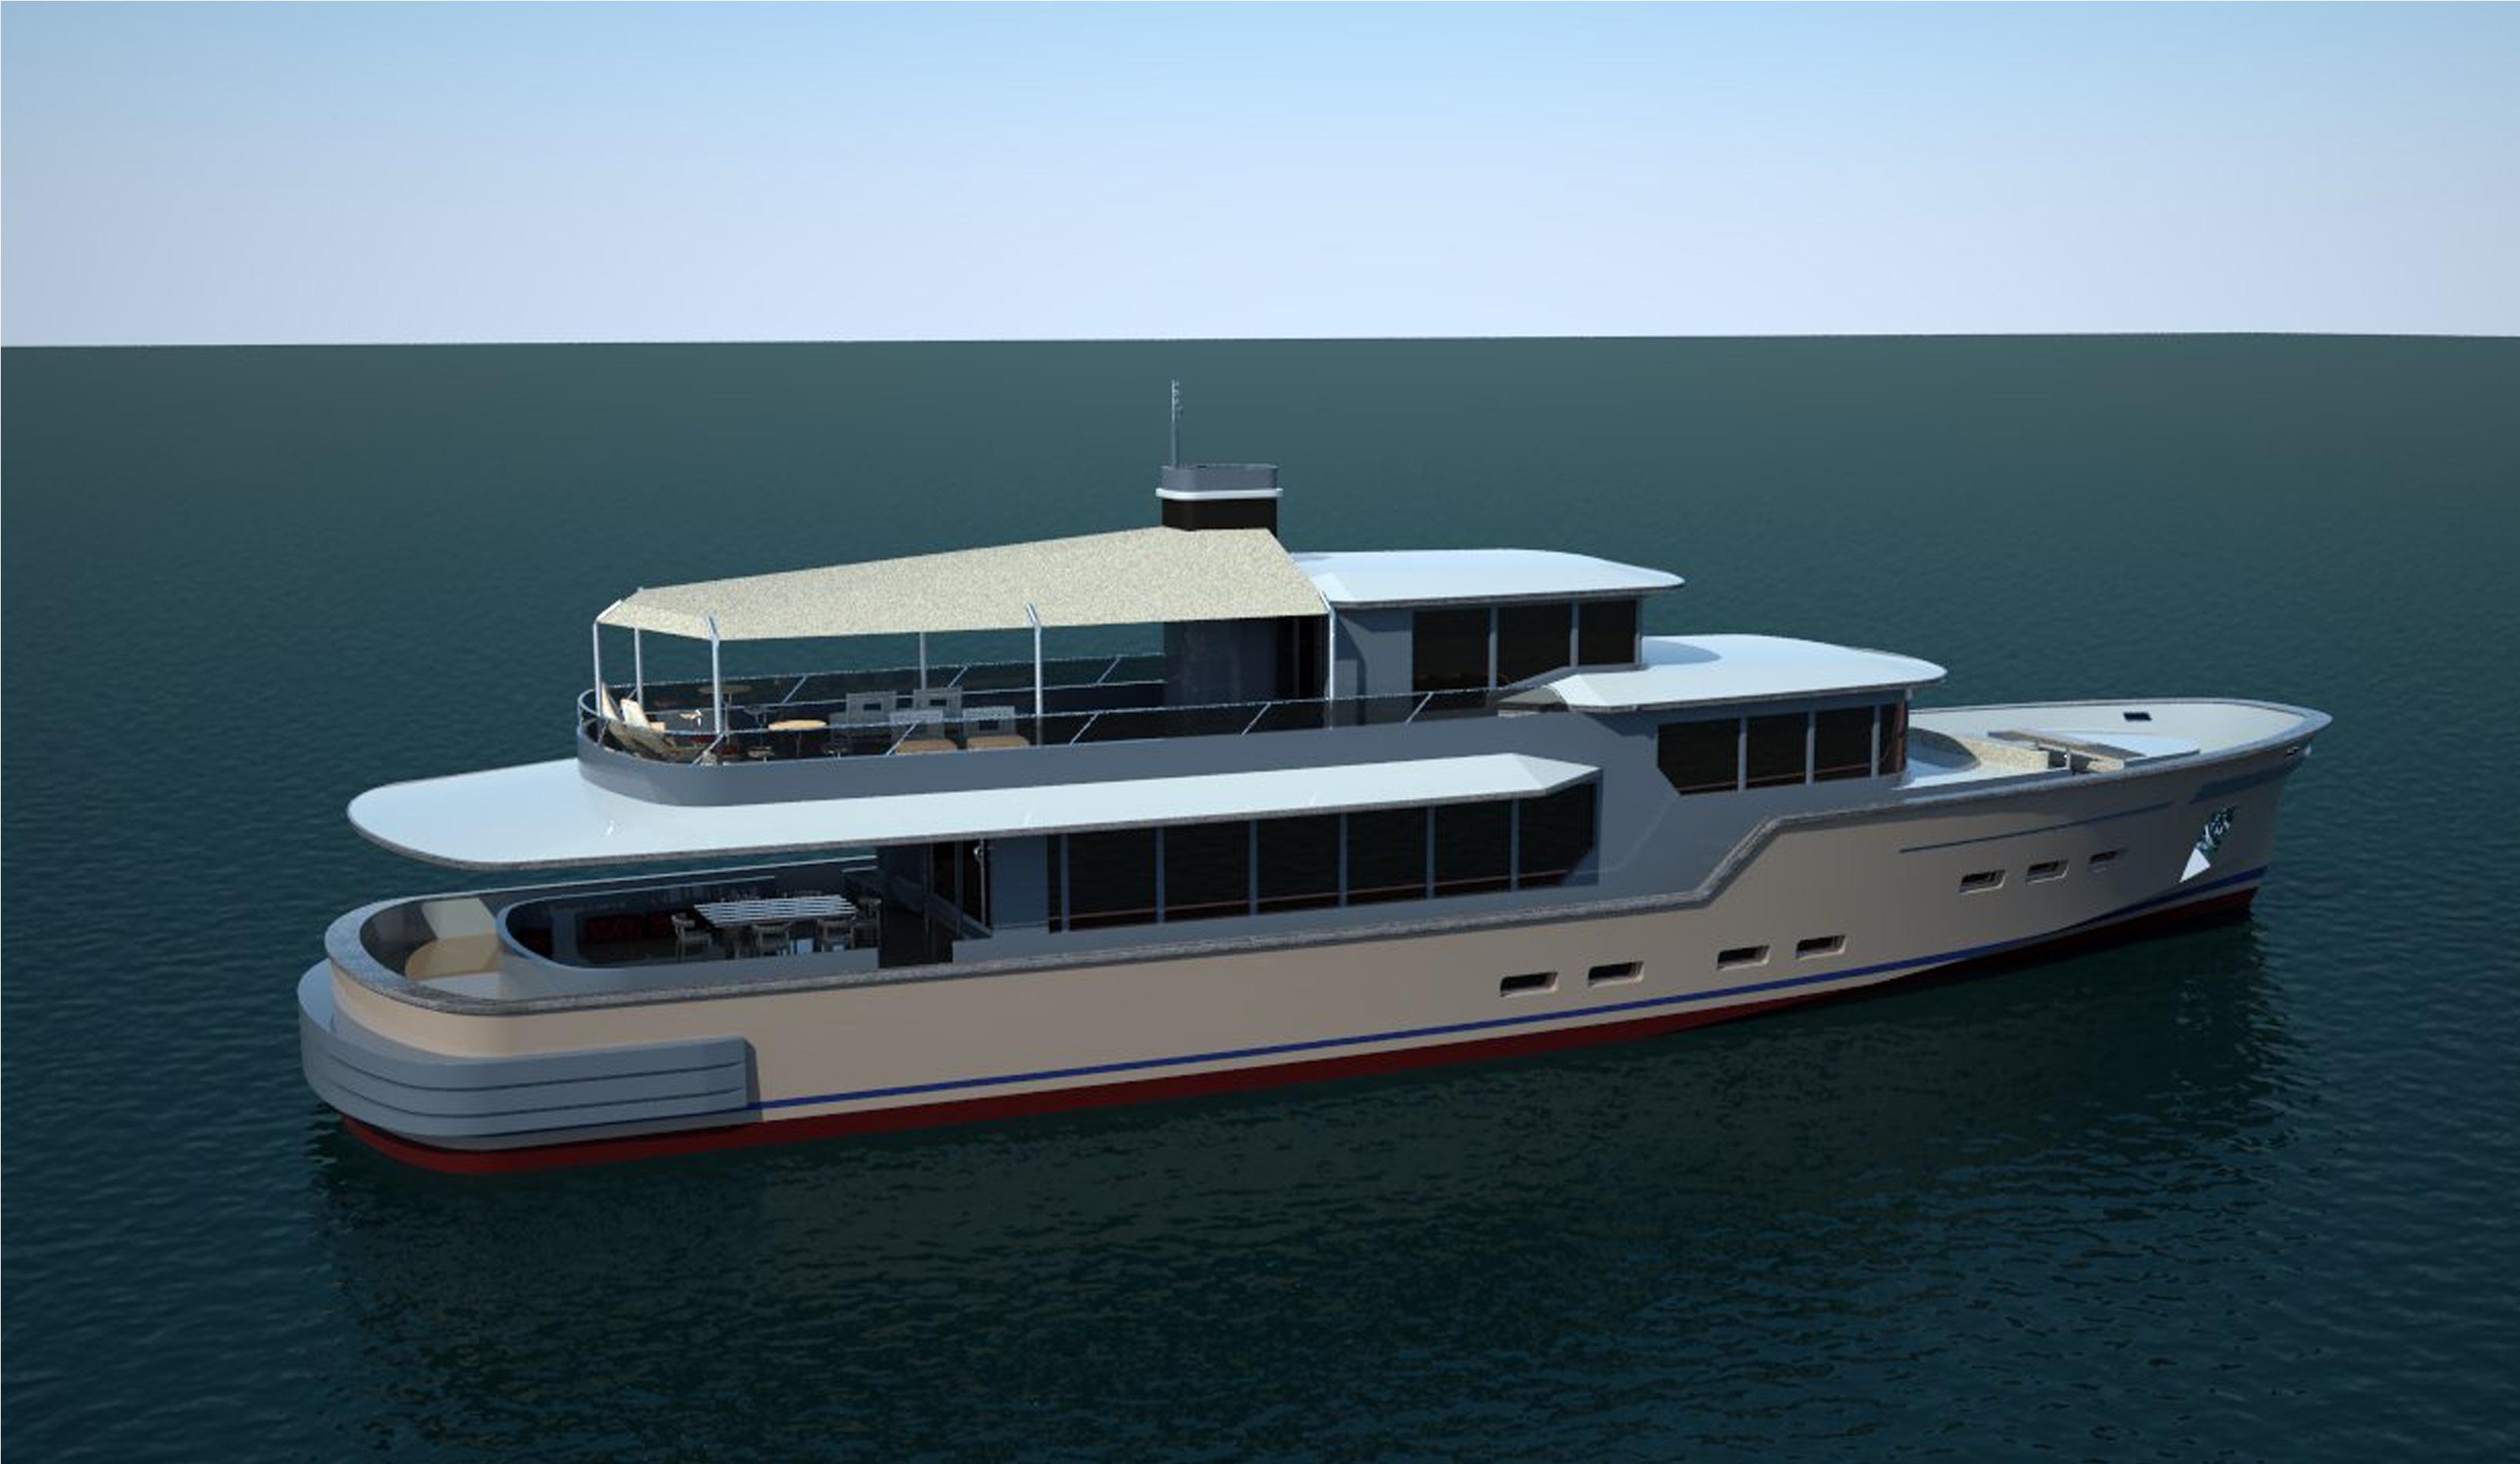 32m Luxury Yacht Castle Yacht Charter Superyacht News